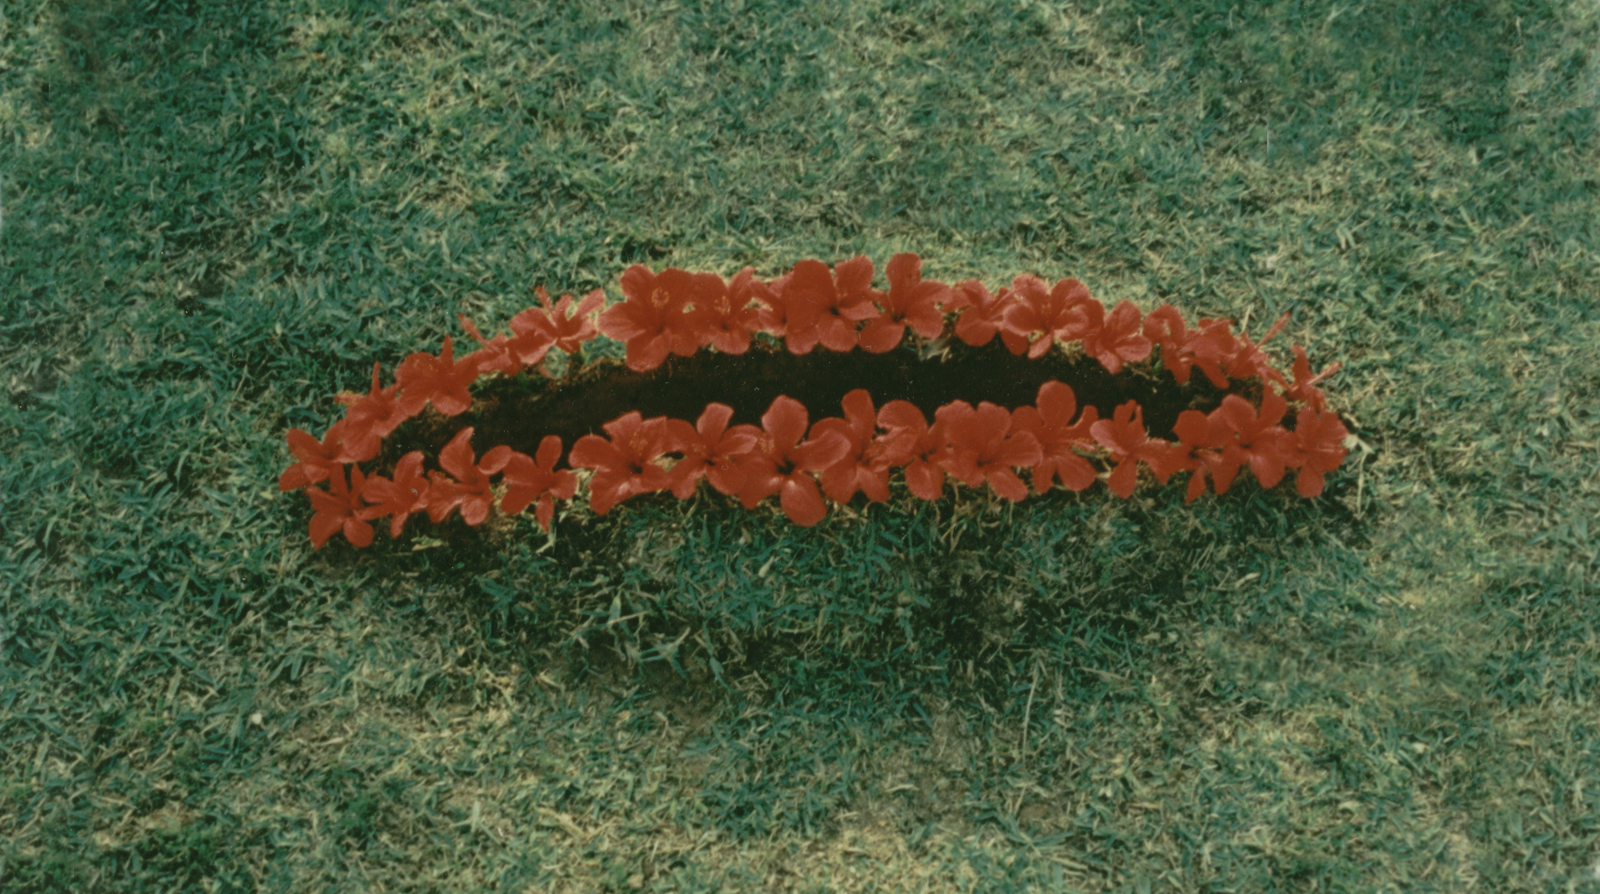 Cut-1987.Soil-grassflowers.150-x-60-x-38-cm.-Givat-Brener